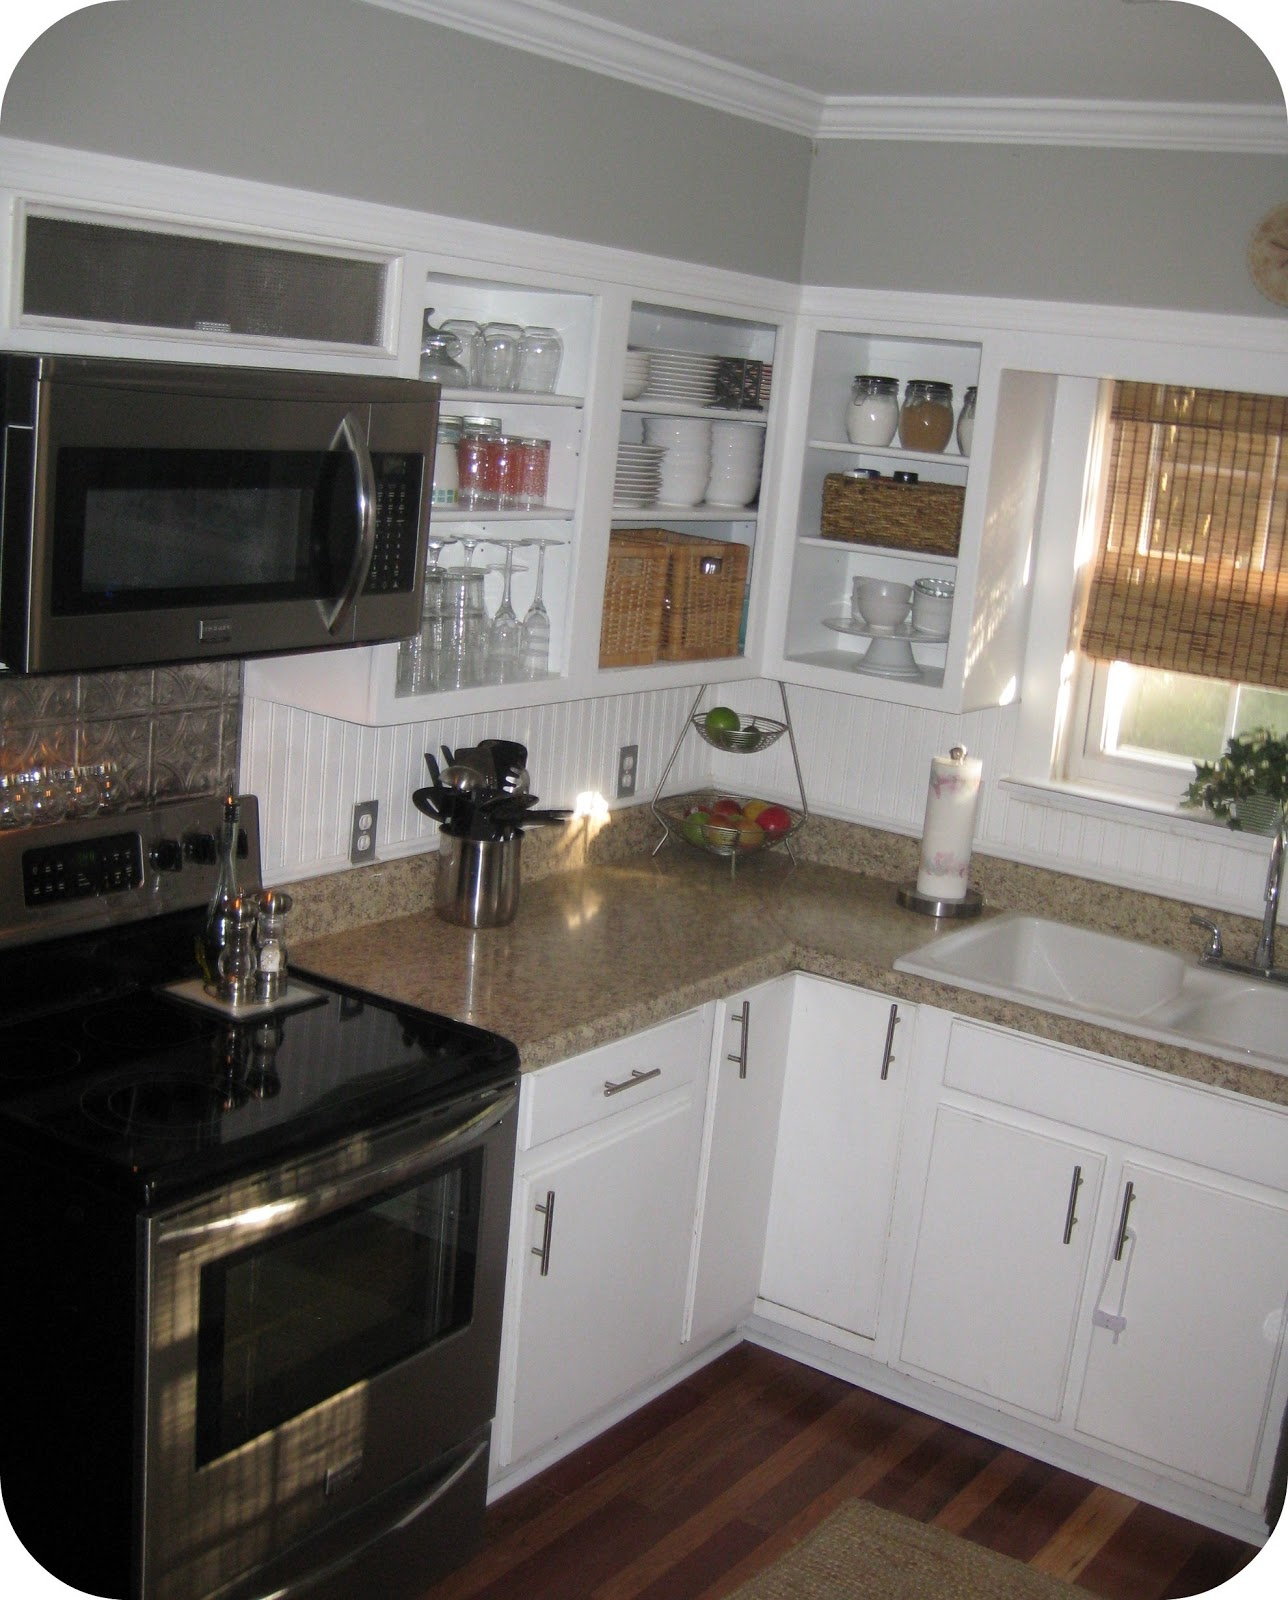 Kitchen Backsplash Youtube: Beautiful Kitchen Renovation Reveal